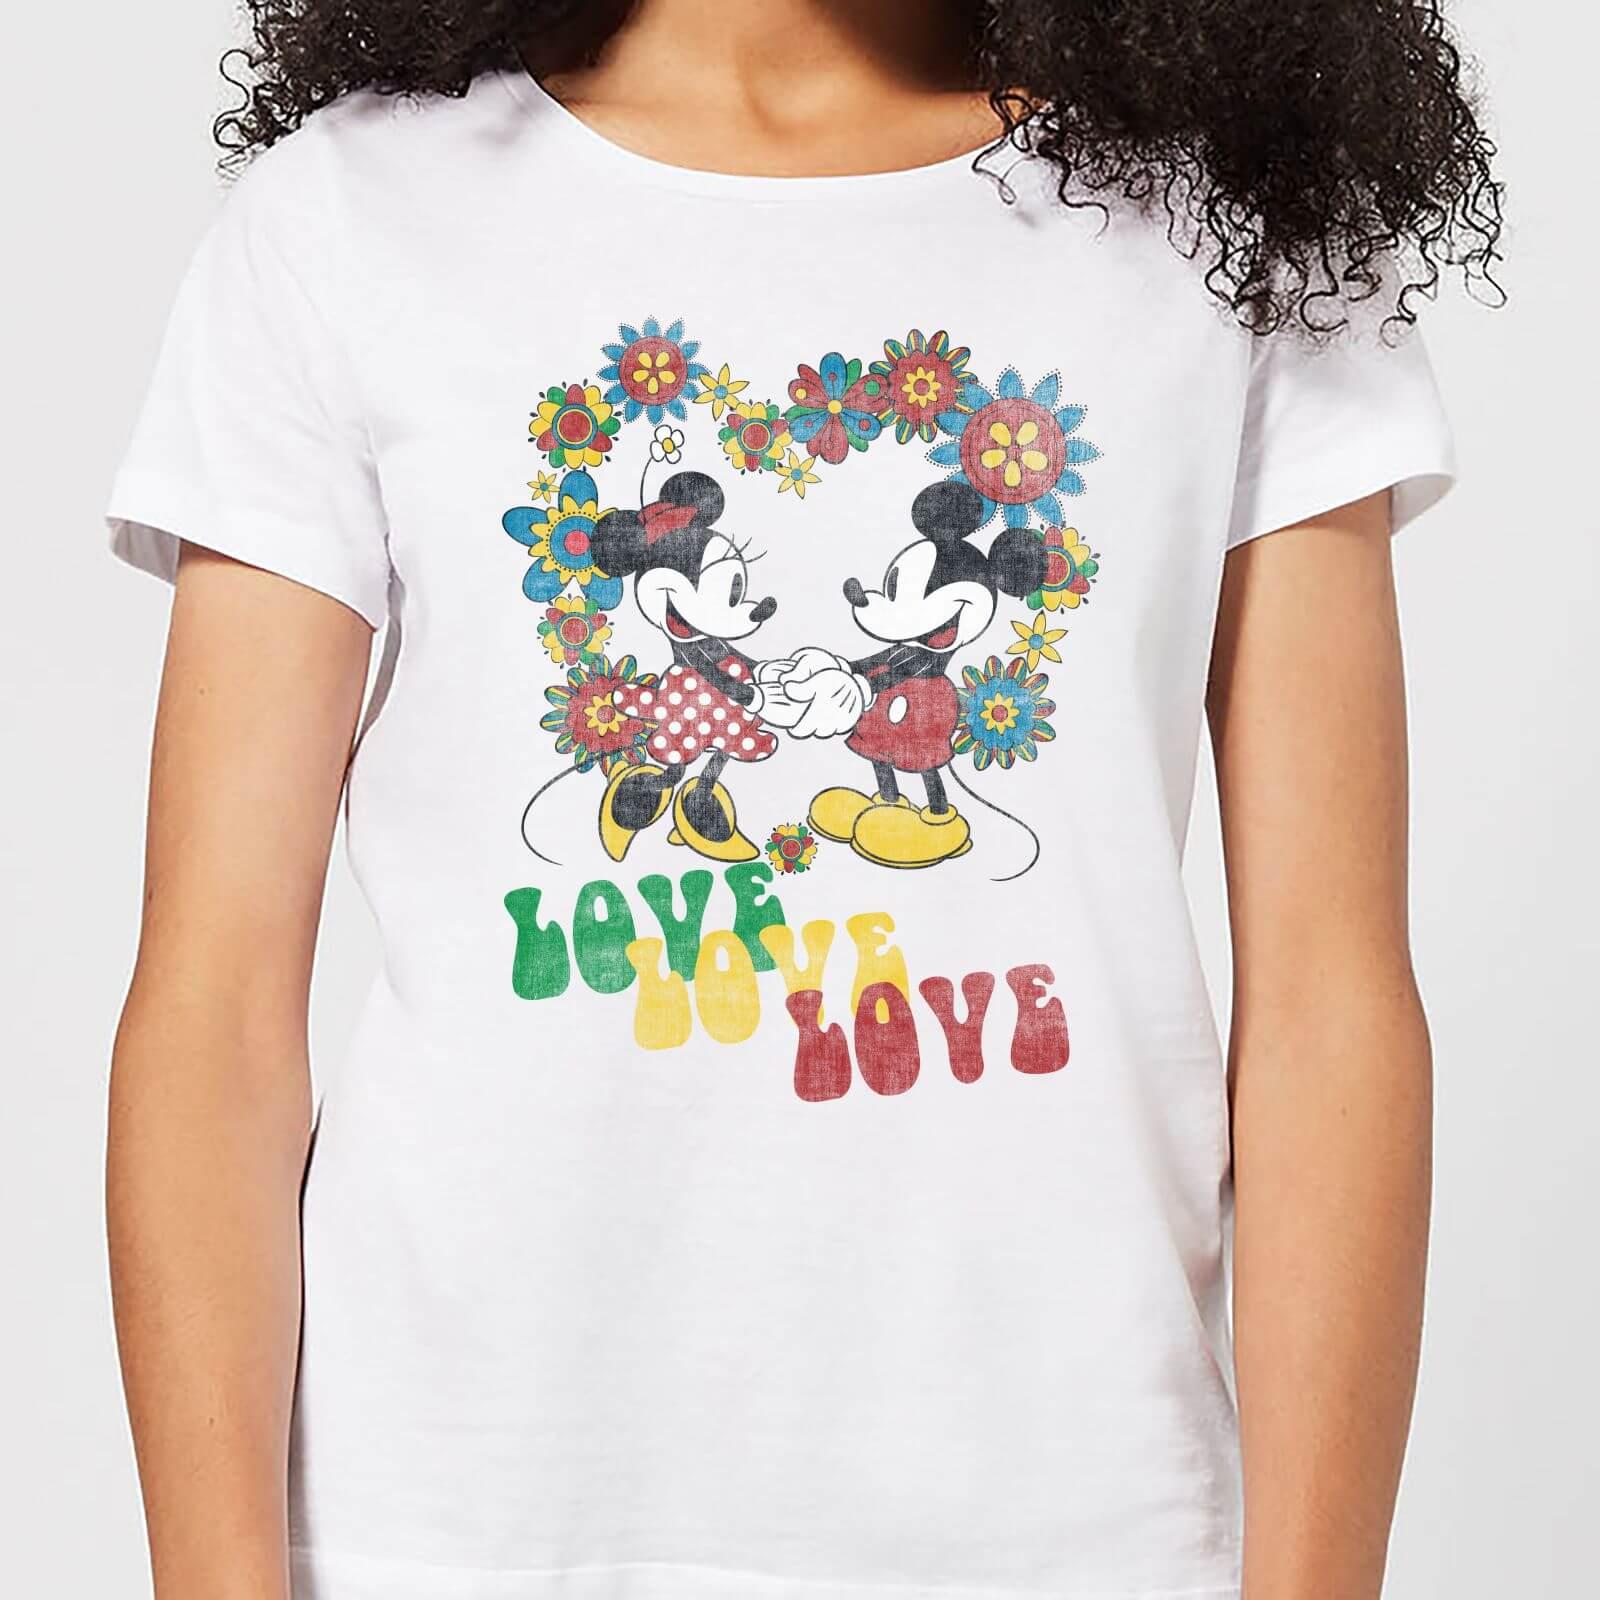 Disney Mickey Mouse Hippie Love Women's T-Shirt - White - L - White